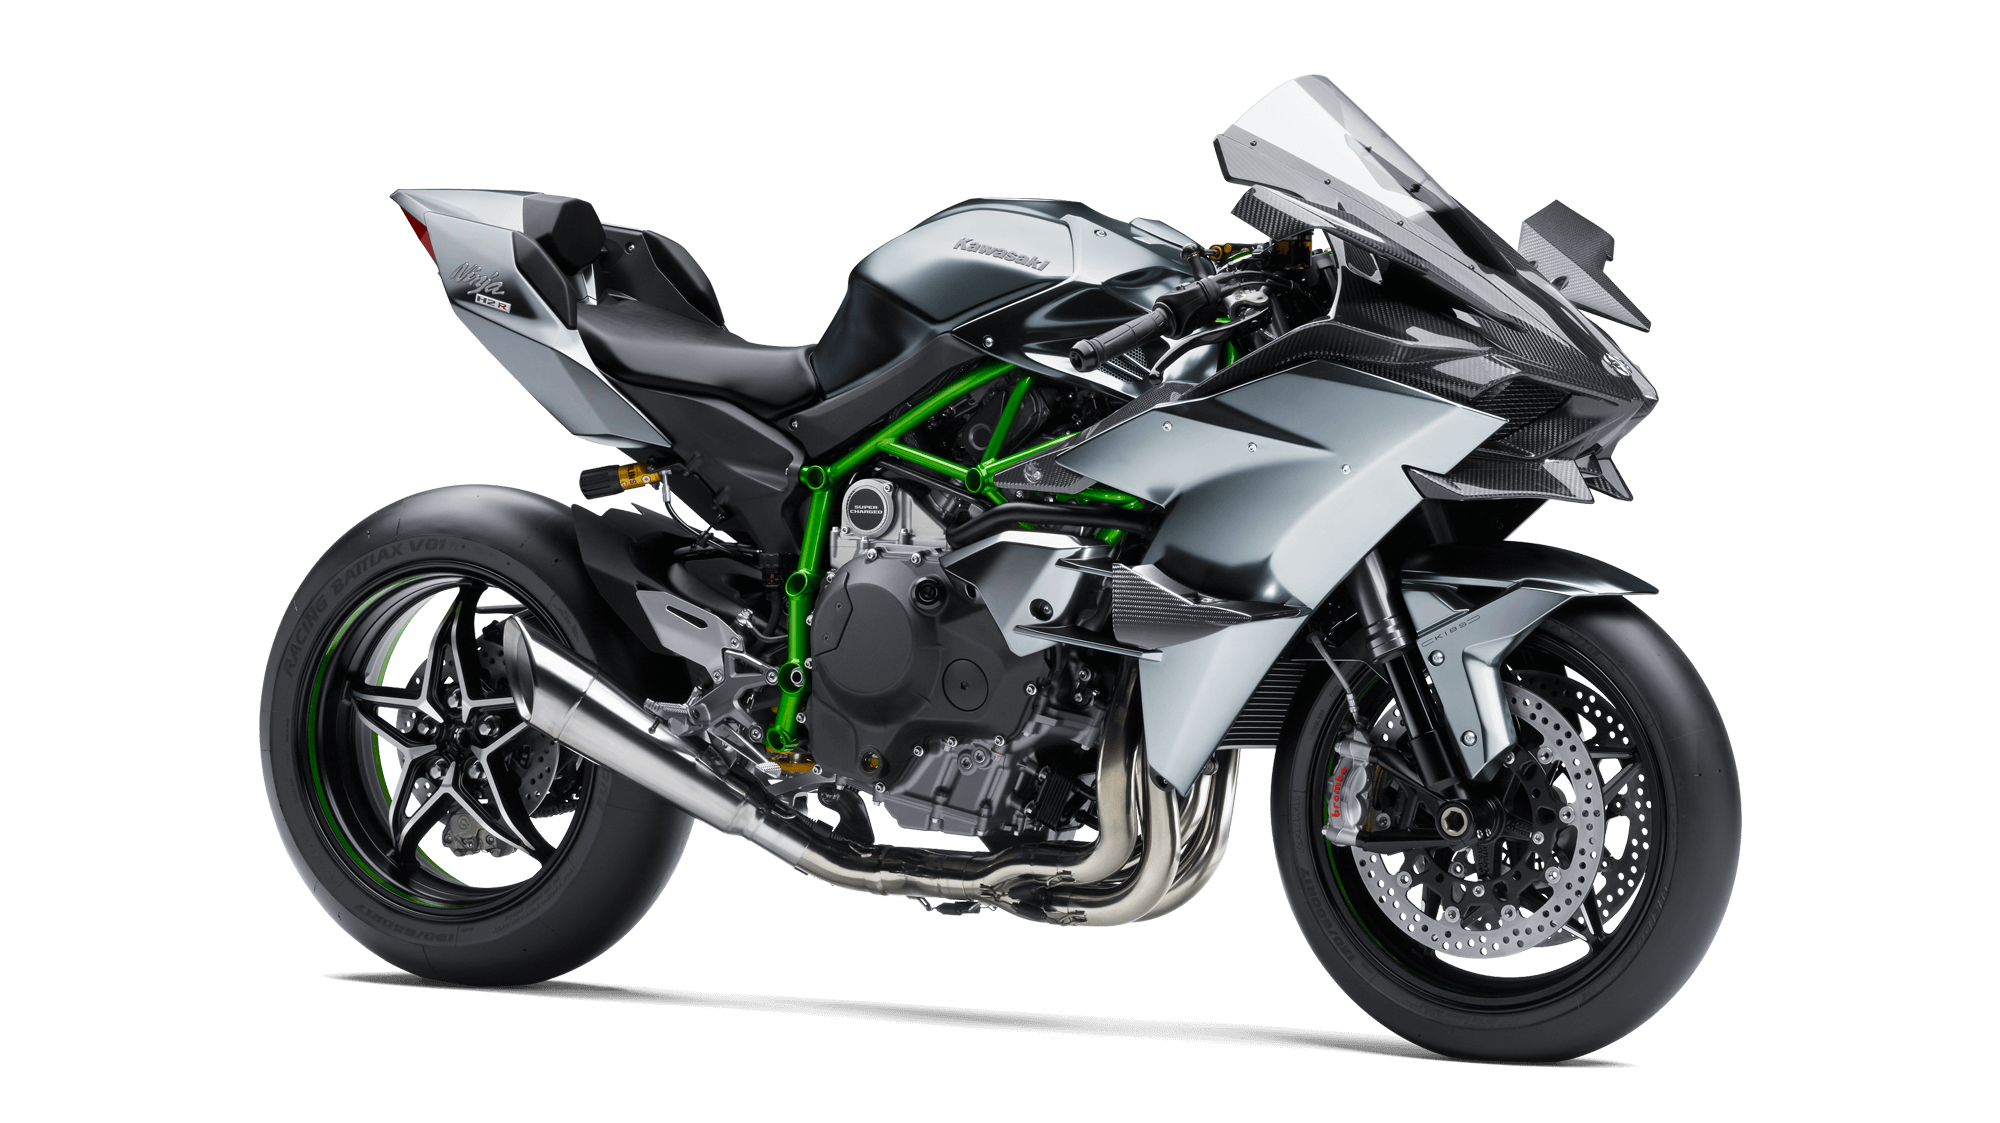 Designing a Car Vs Designing a Motorcycle